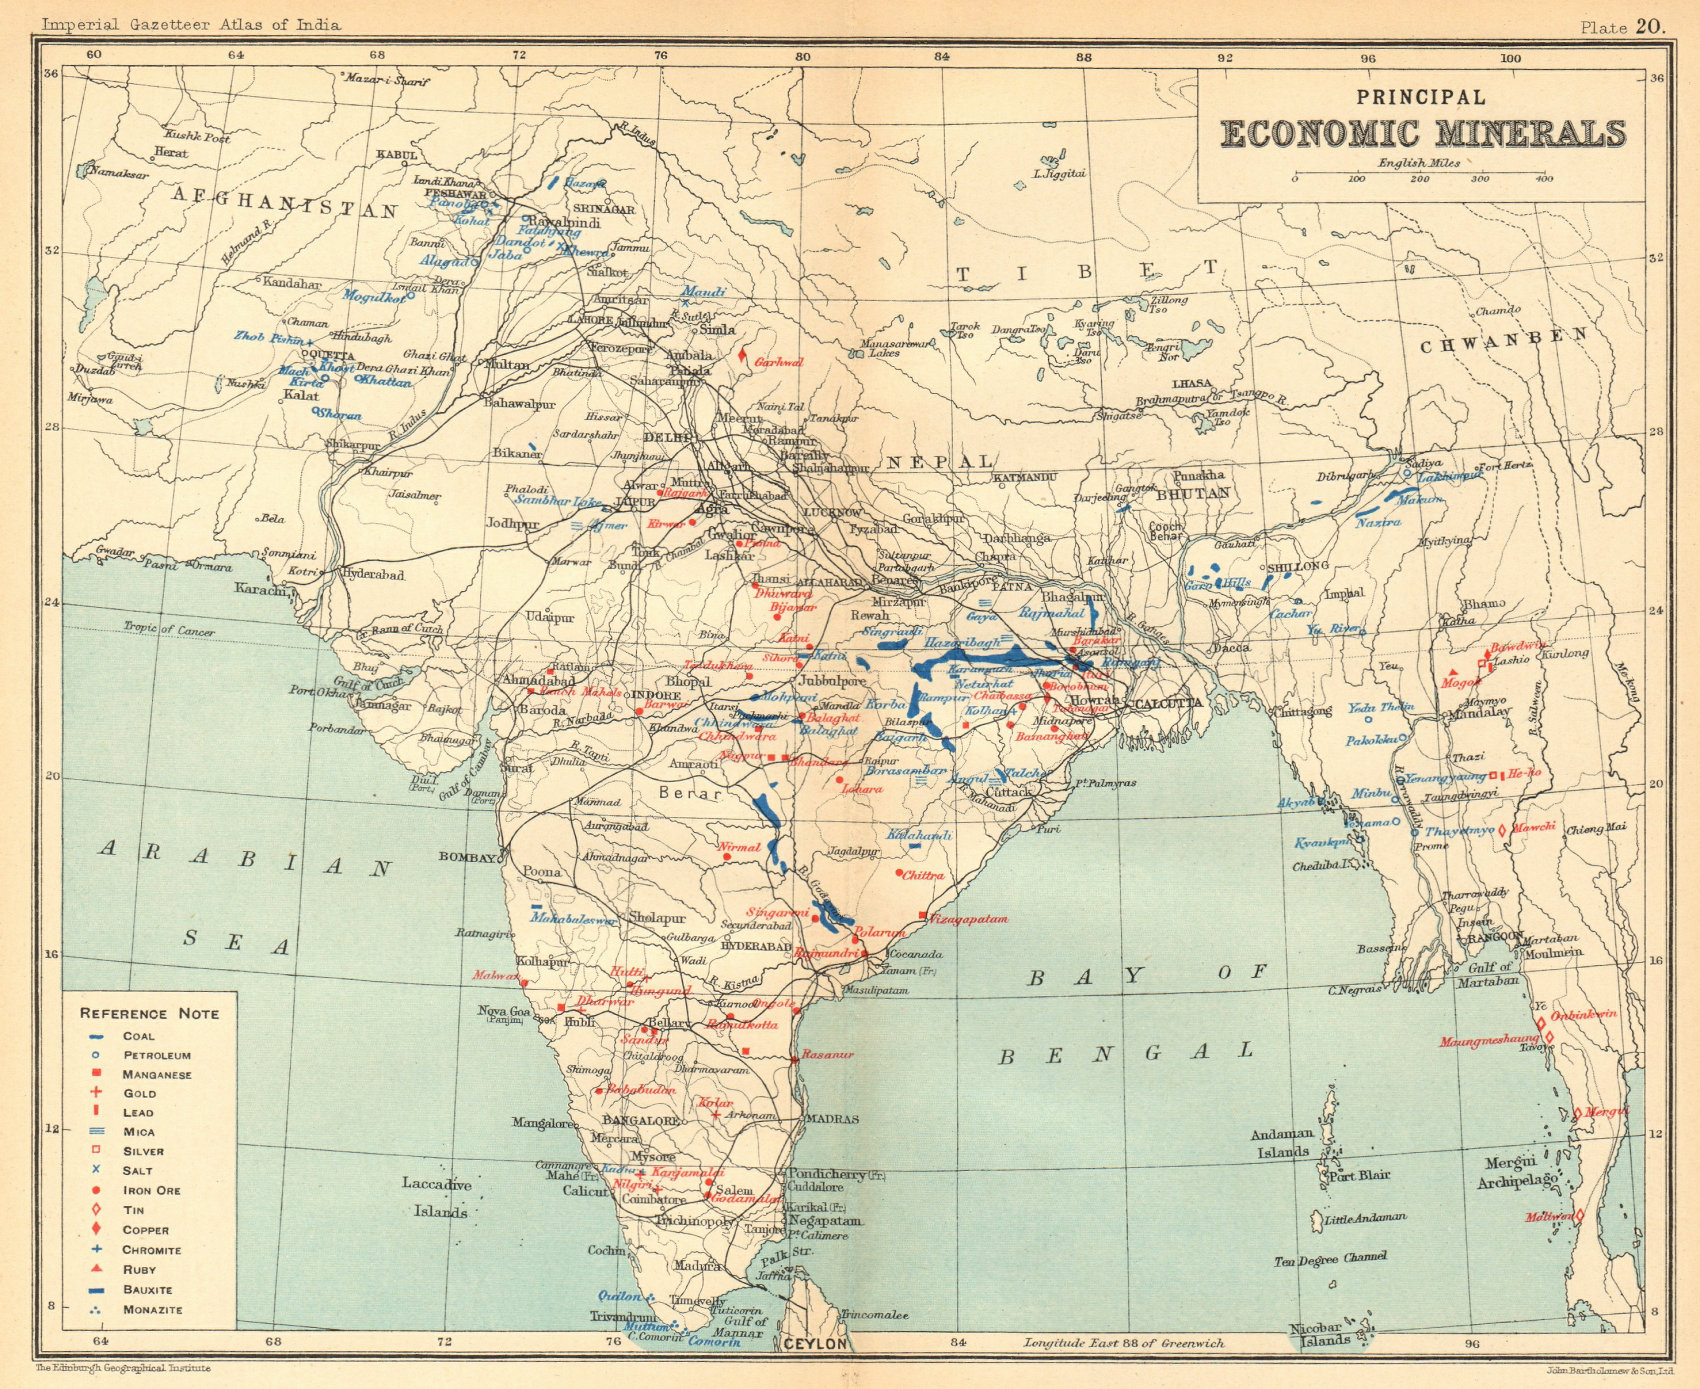 BRITISH INDIA Mineral production. Coal Iron Gold Salt Petrol Manganese 1931 map